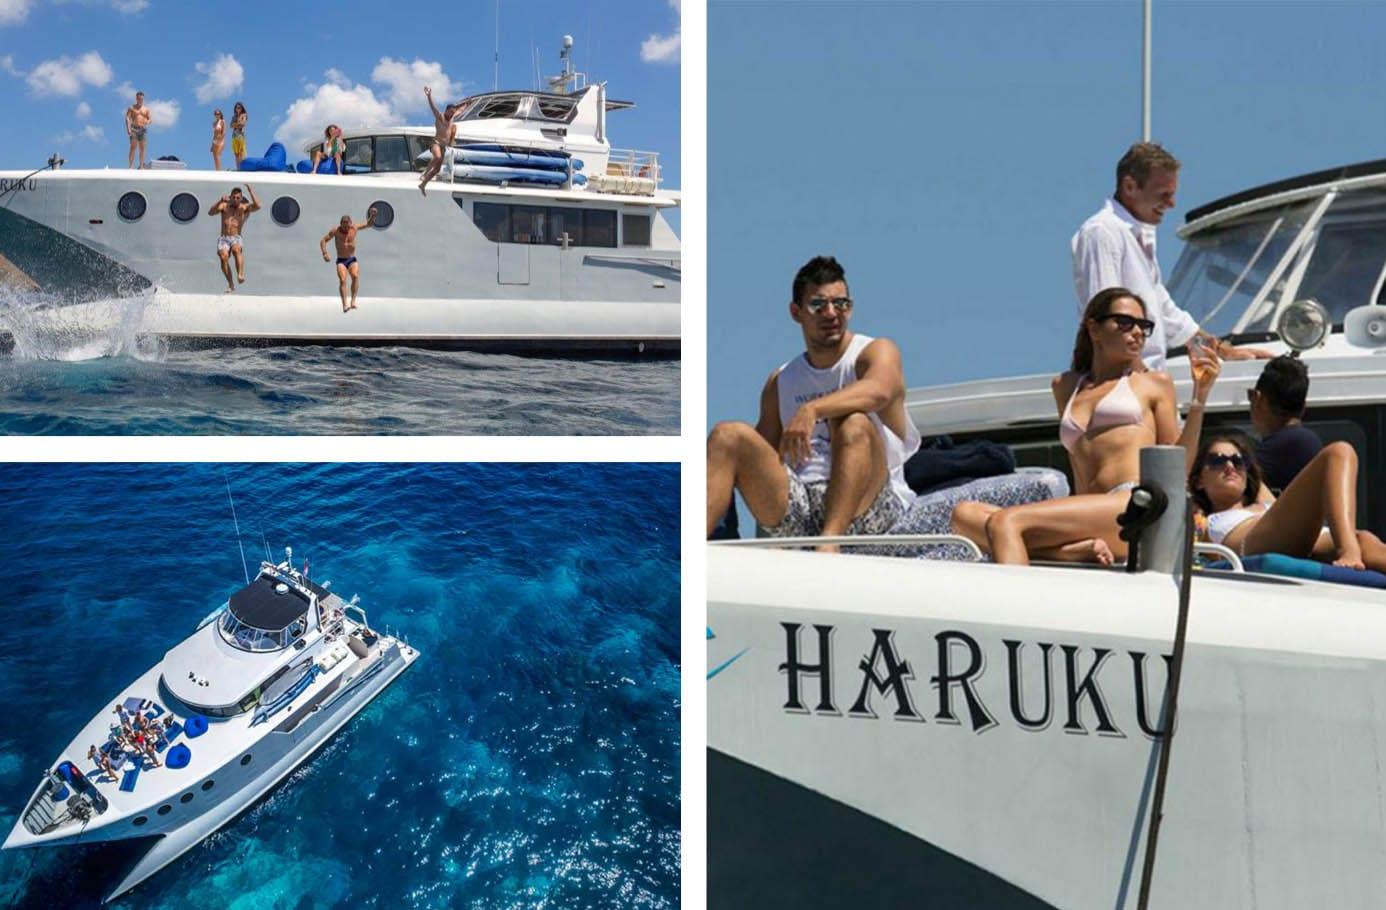 Haruku-Luxury-Catamaran-Bali